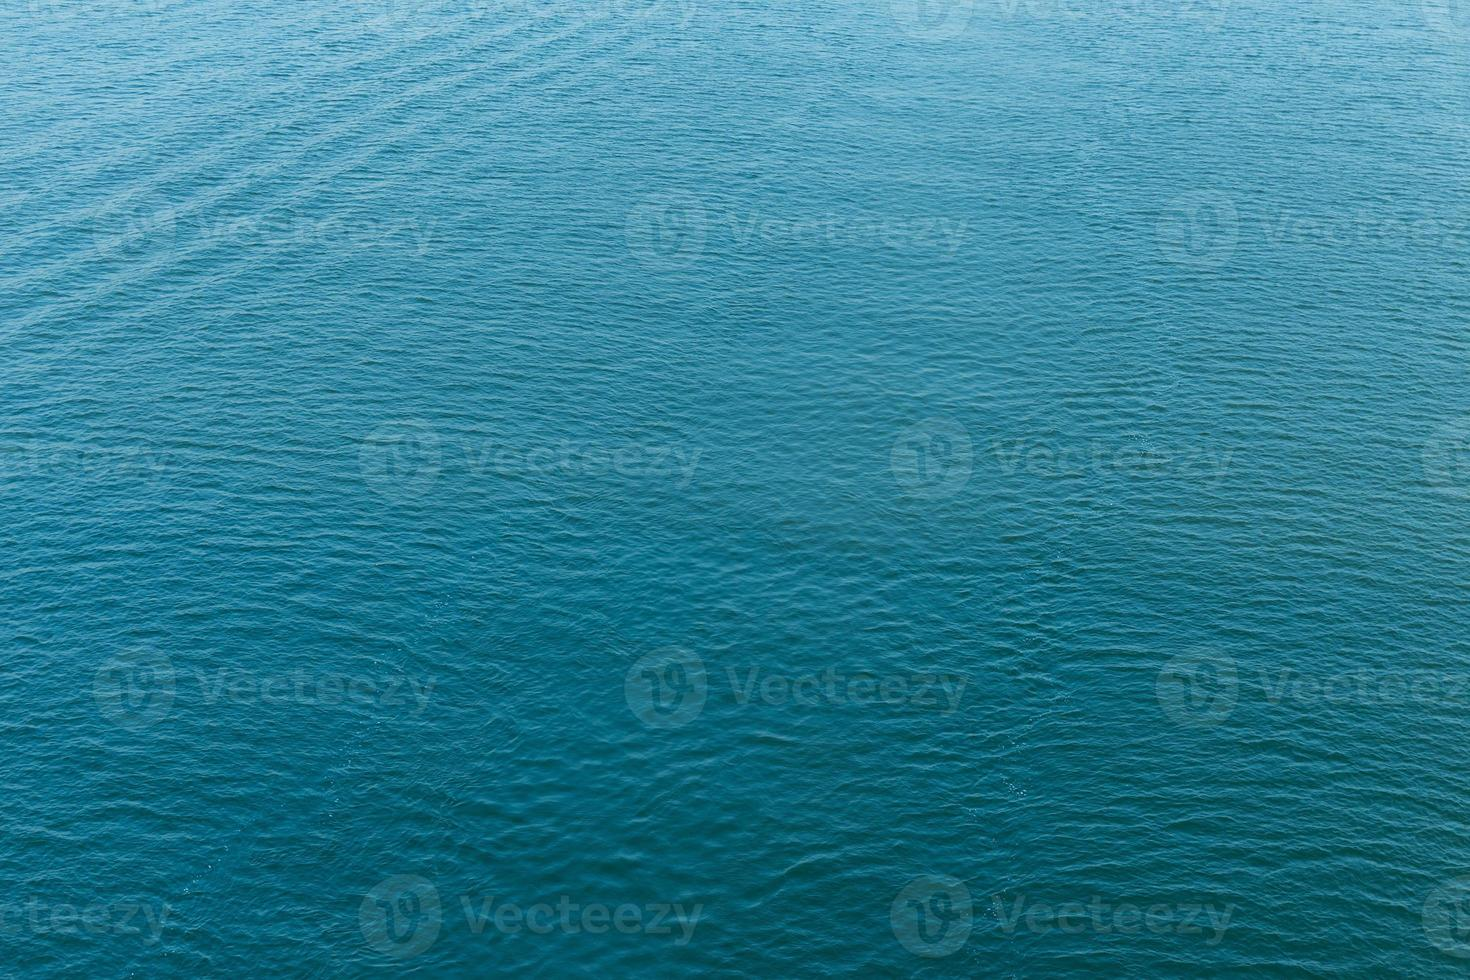 Ripple on water surface photo